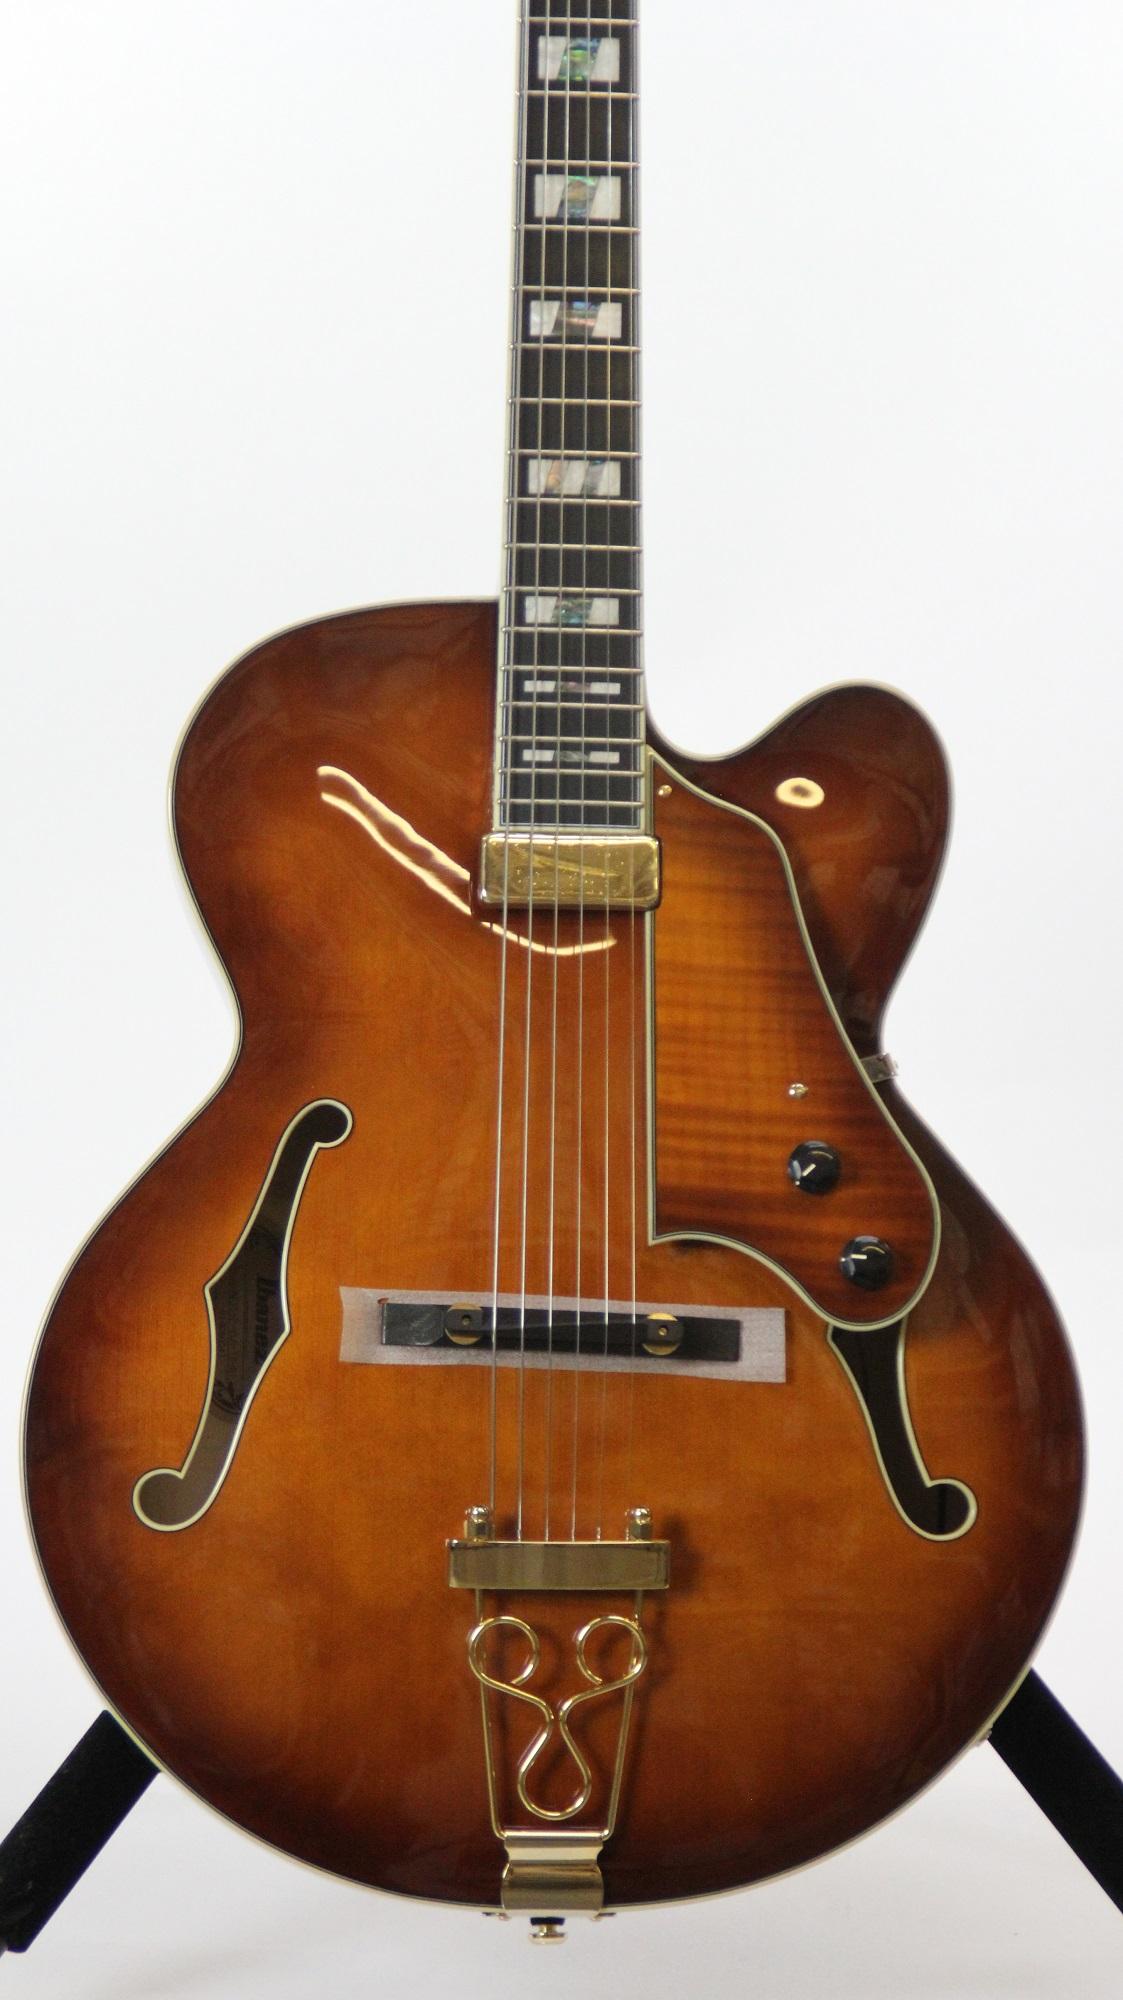 Acoustic Guitar Parts On An Acoustic Guitar